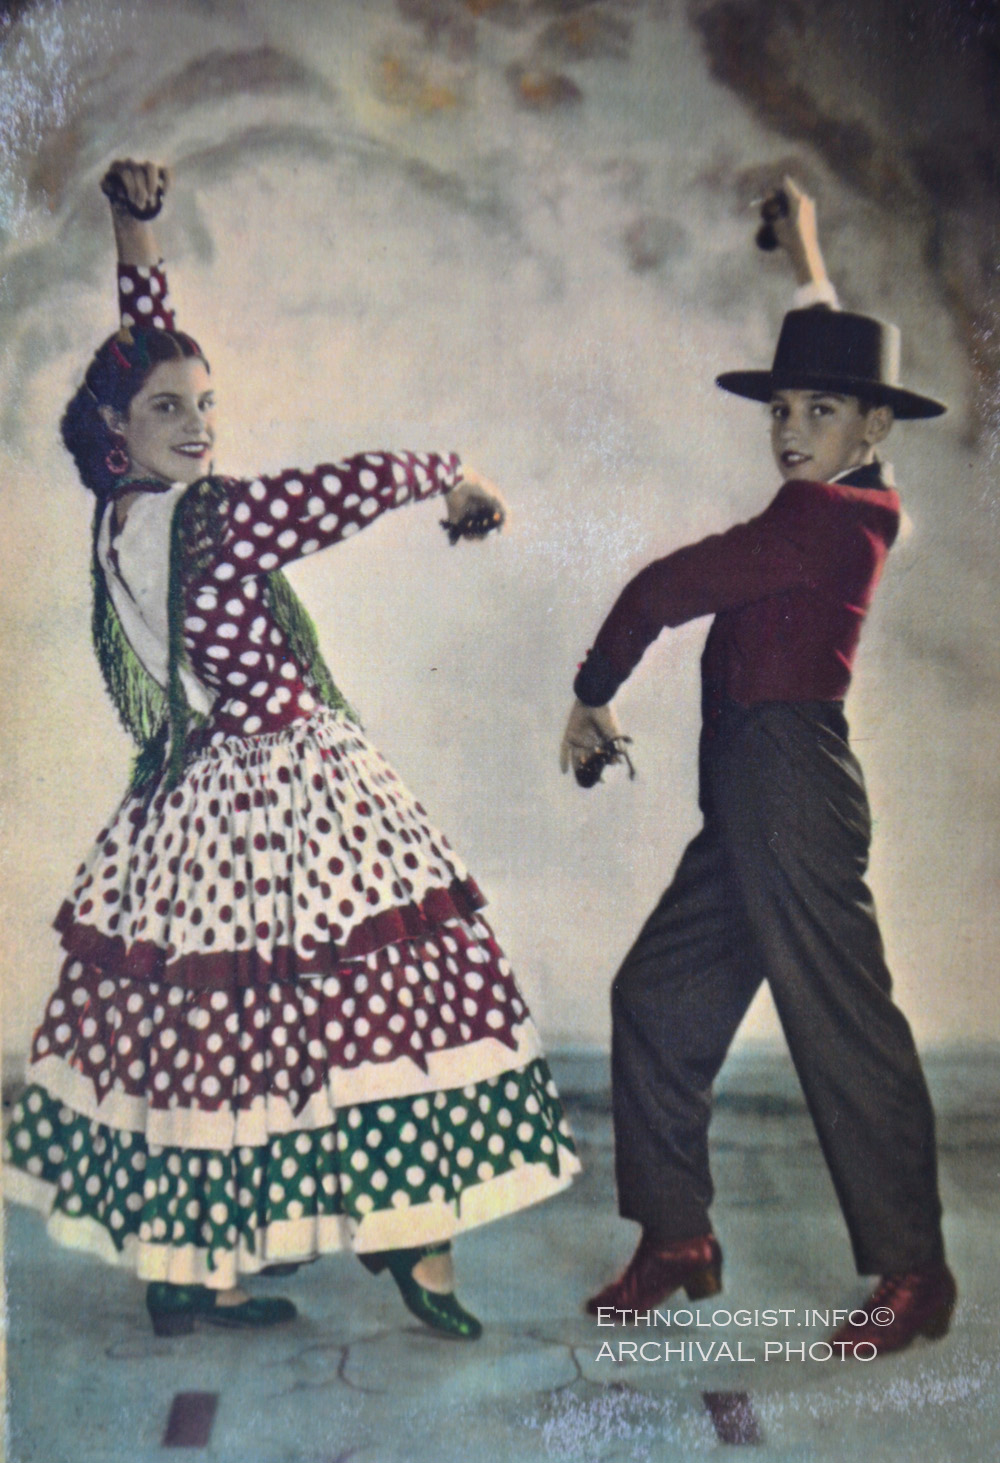 The Uruguayan children of Italian-Spanish parents in Uruguay. Soledad Barnó Piazza (leftside) and Fermín Pedro Barnó Piazza (rightside). Archival Photo: ethnologist.info